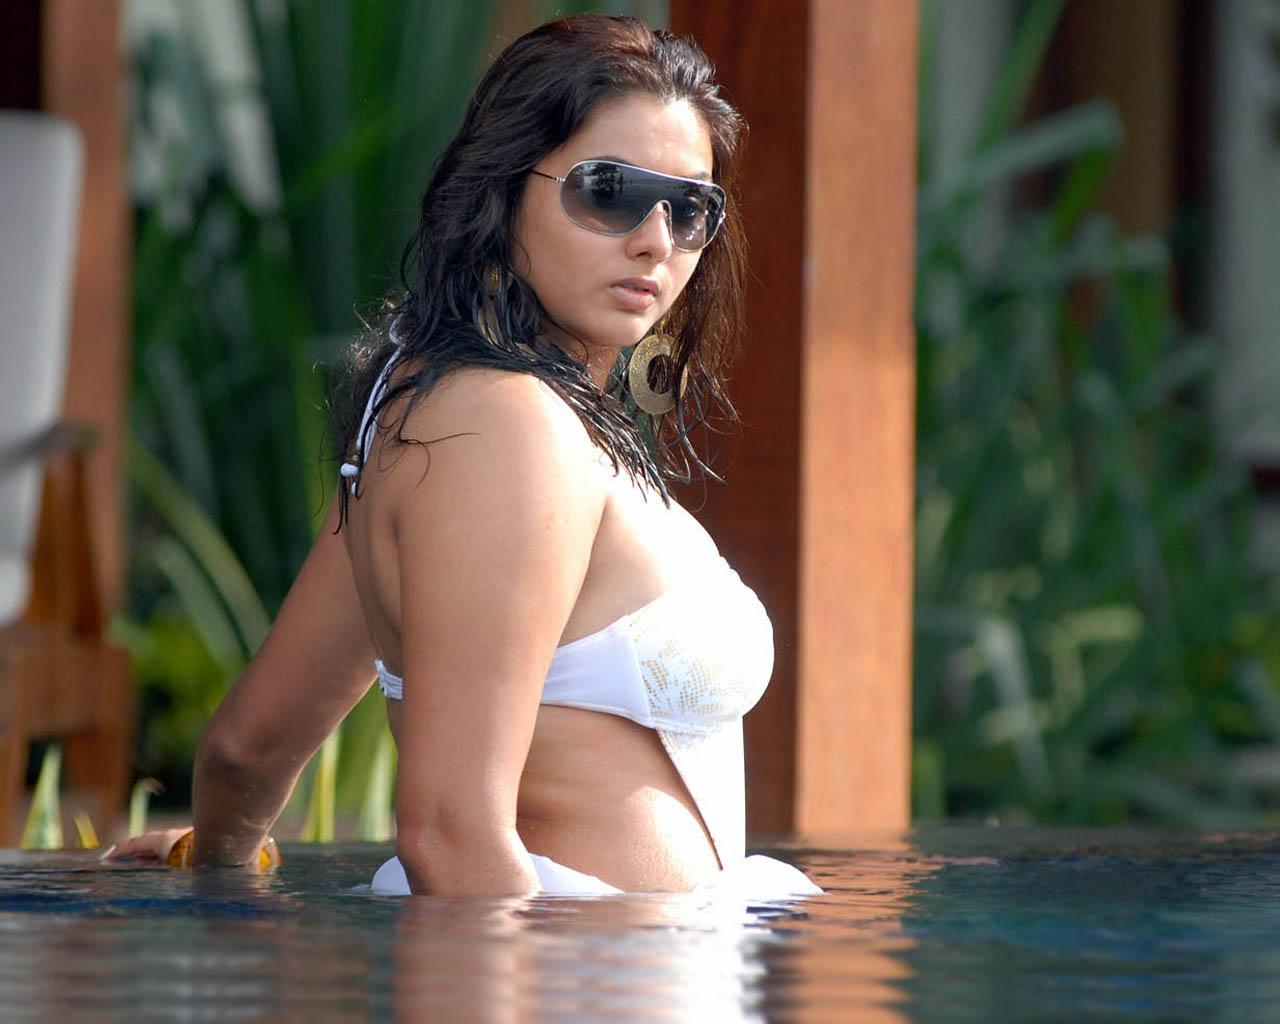 namitha hot bikini pics ~ latest wallpapers of film celebrities